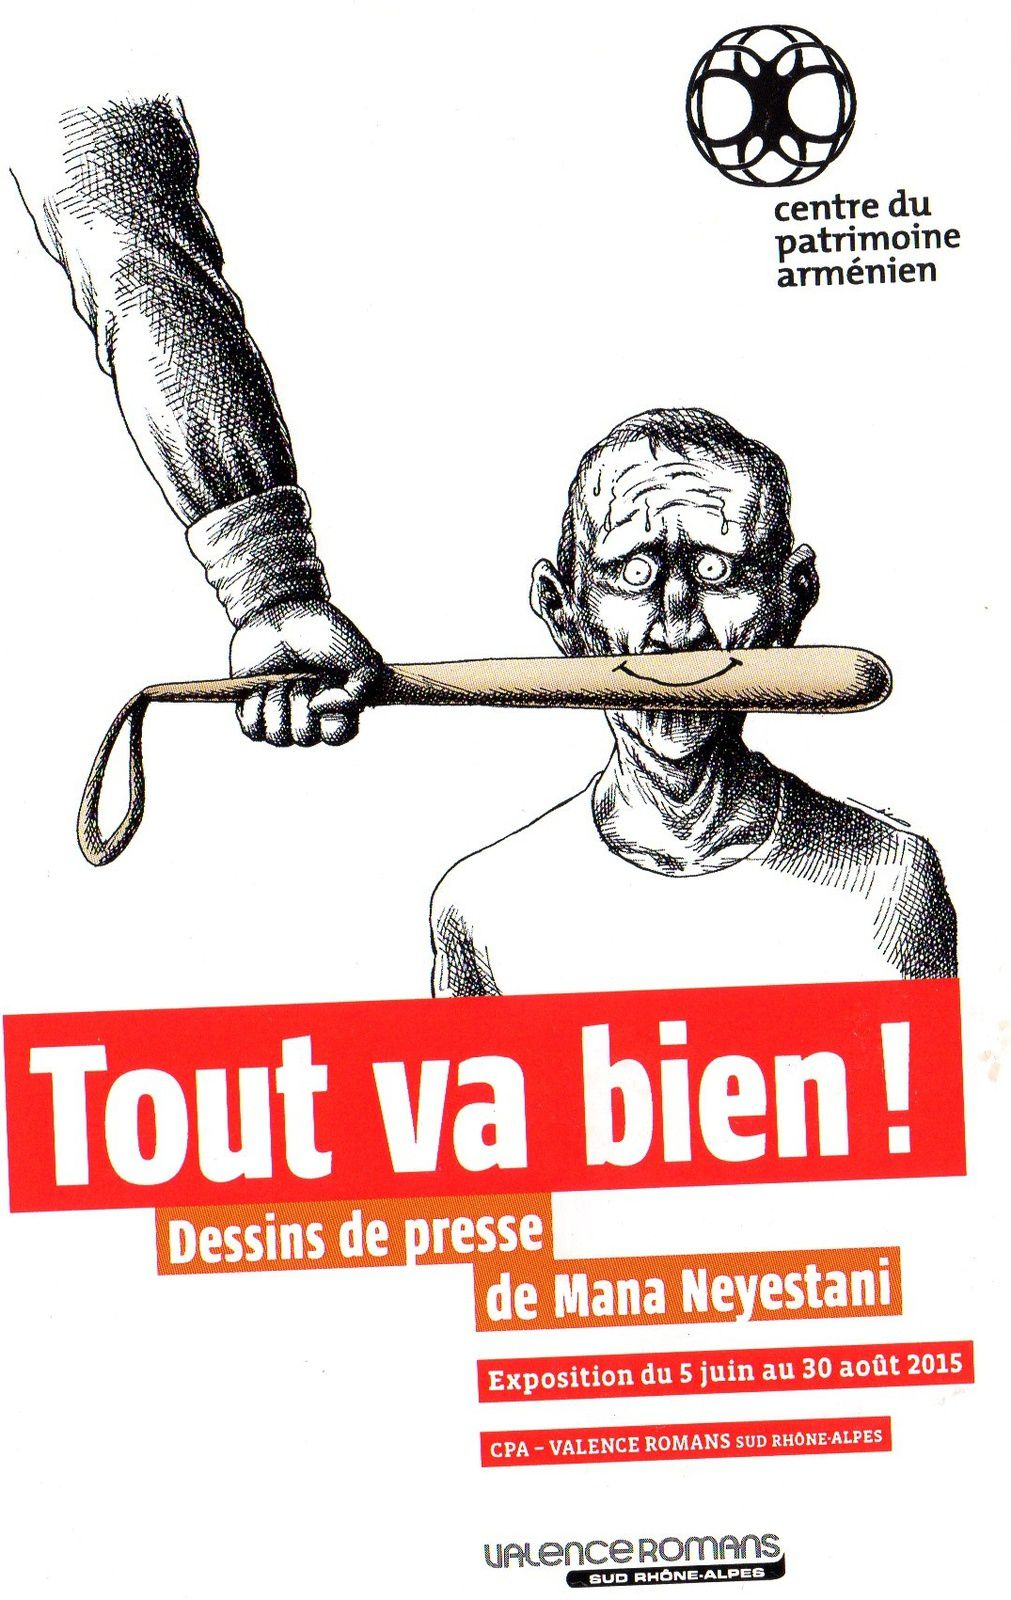 Tout va bien ! exposition de dessins de Mana Neyestani